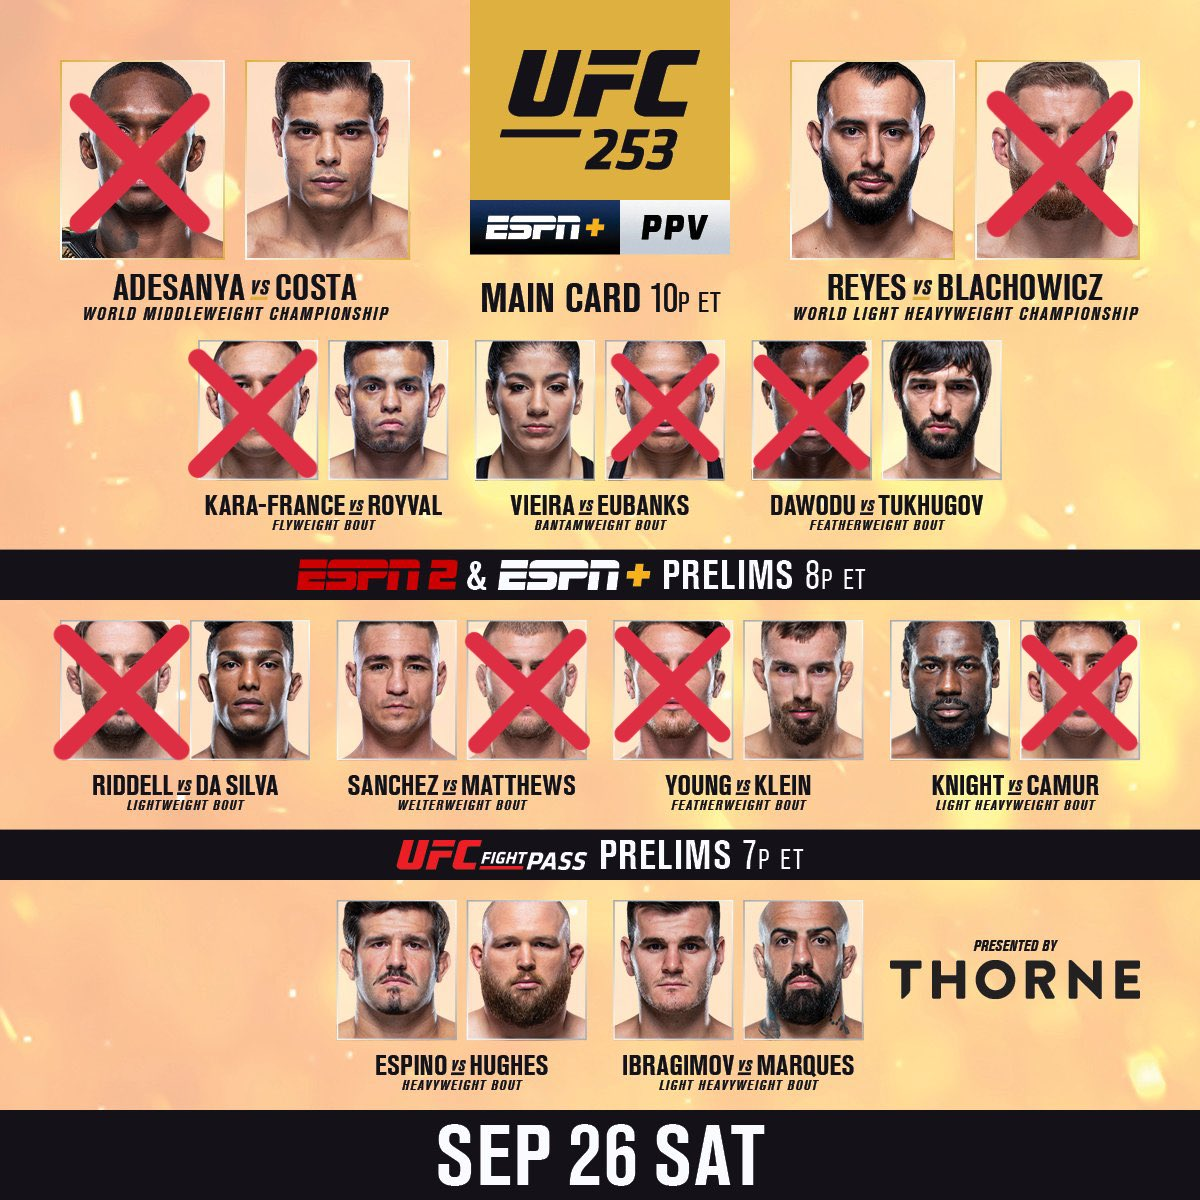 Yooo, #RENfam! IT'S FIGHT DAY!! Here are my #UFC253 #Predictions!  LETS GOOO!! 💯🔥🍿   #ufc #mma #bjj #muaythai #kickboxing #jiujitsu #wrestling #martialarts #fighter #mmafighter #karate #judo #grappling #ufcfightnight #brazilianjiujitsu #ufcfightnight #mmafighter #ufcnews https://t.co/psMyJ5pKLX